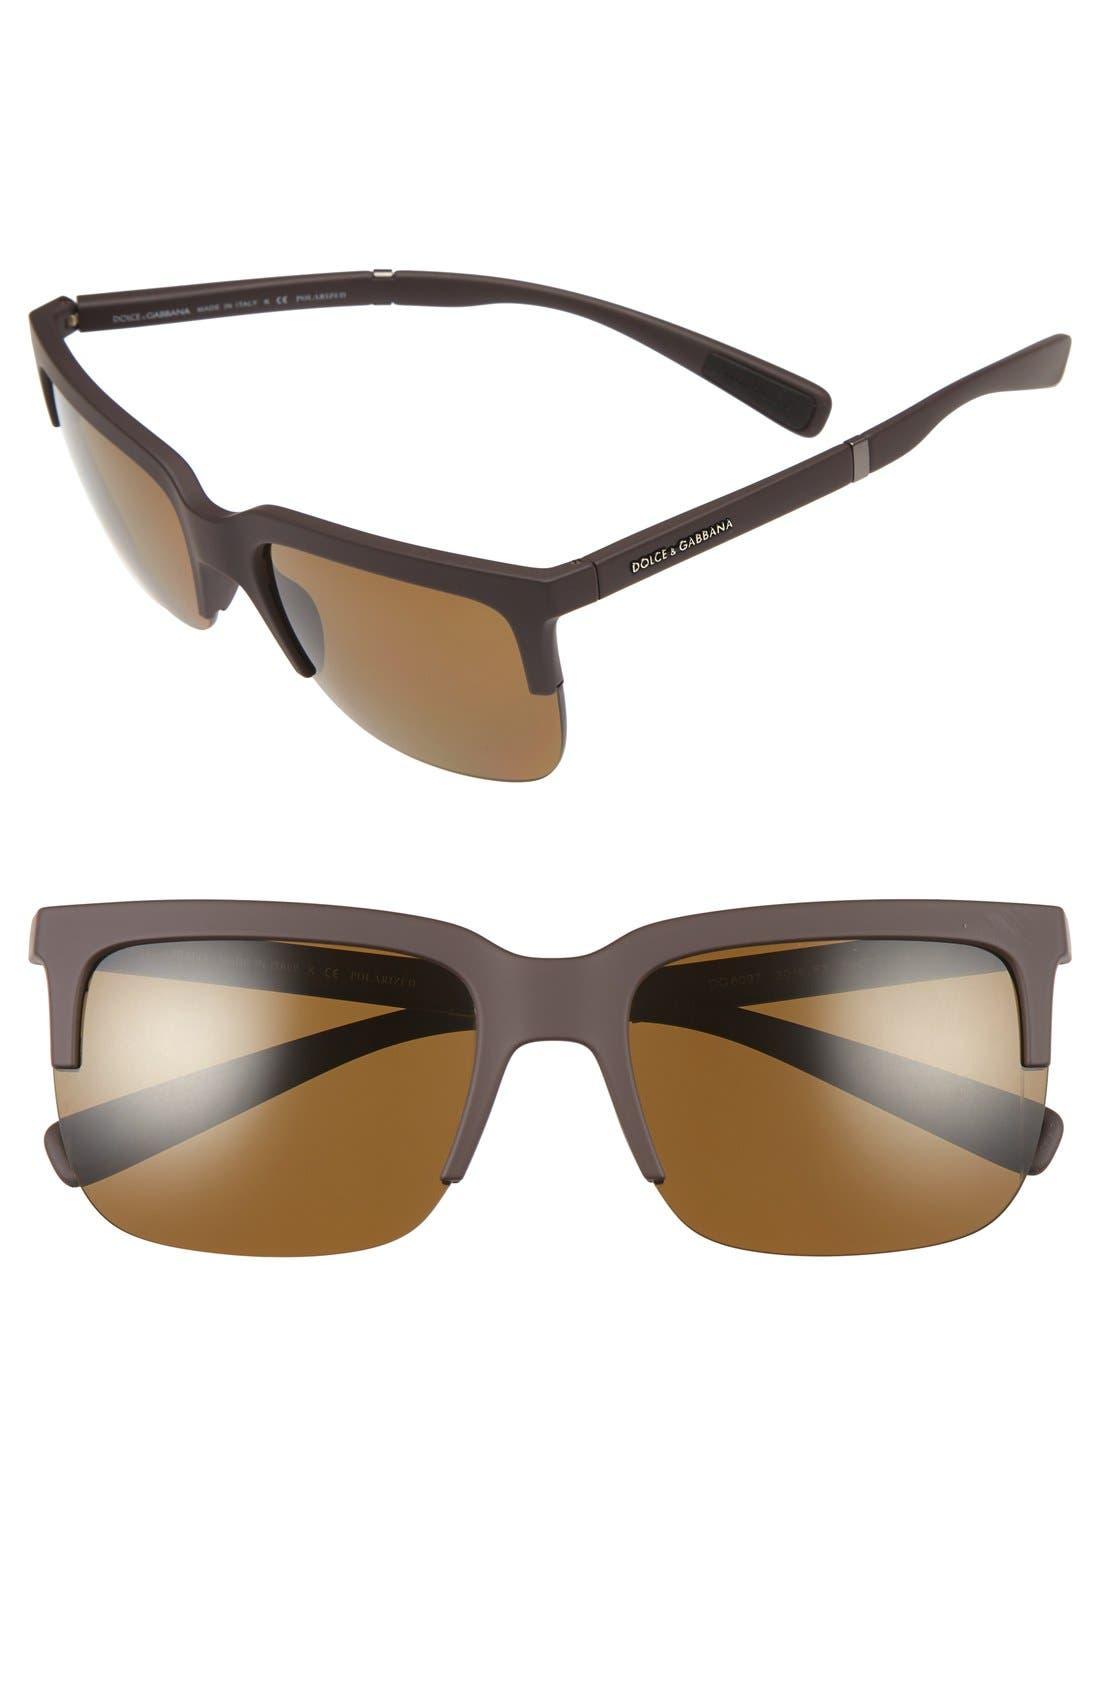 Dolce&Gabbana 58mm Polarized Sunglasses